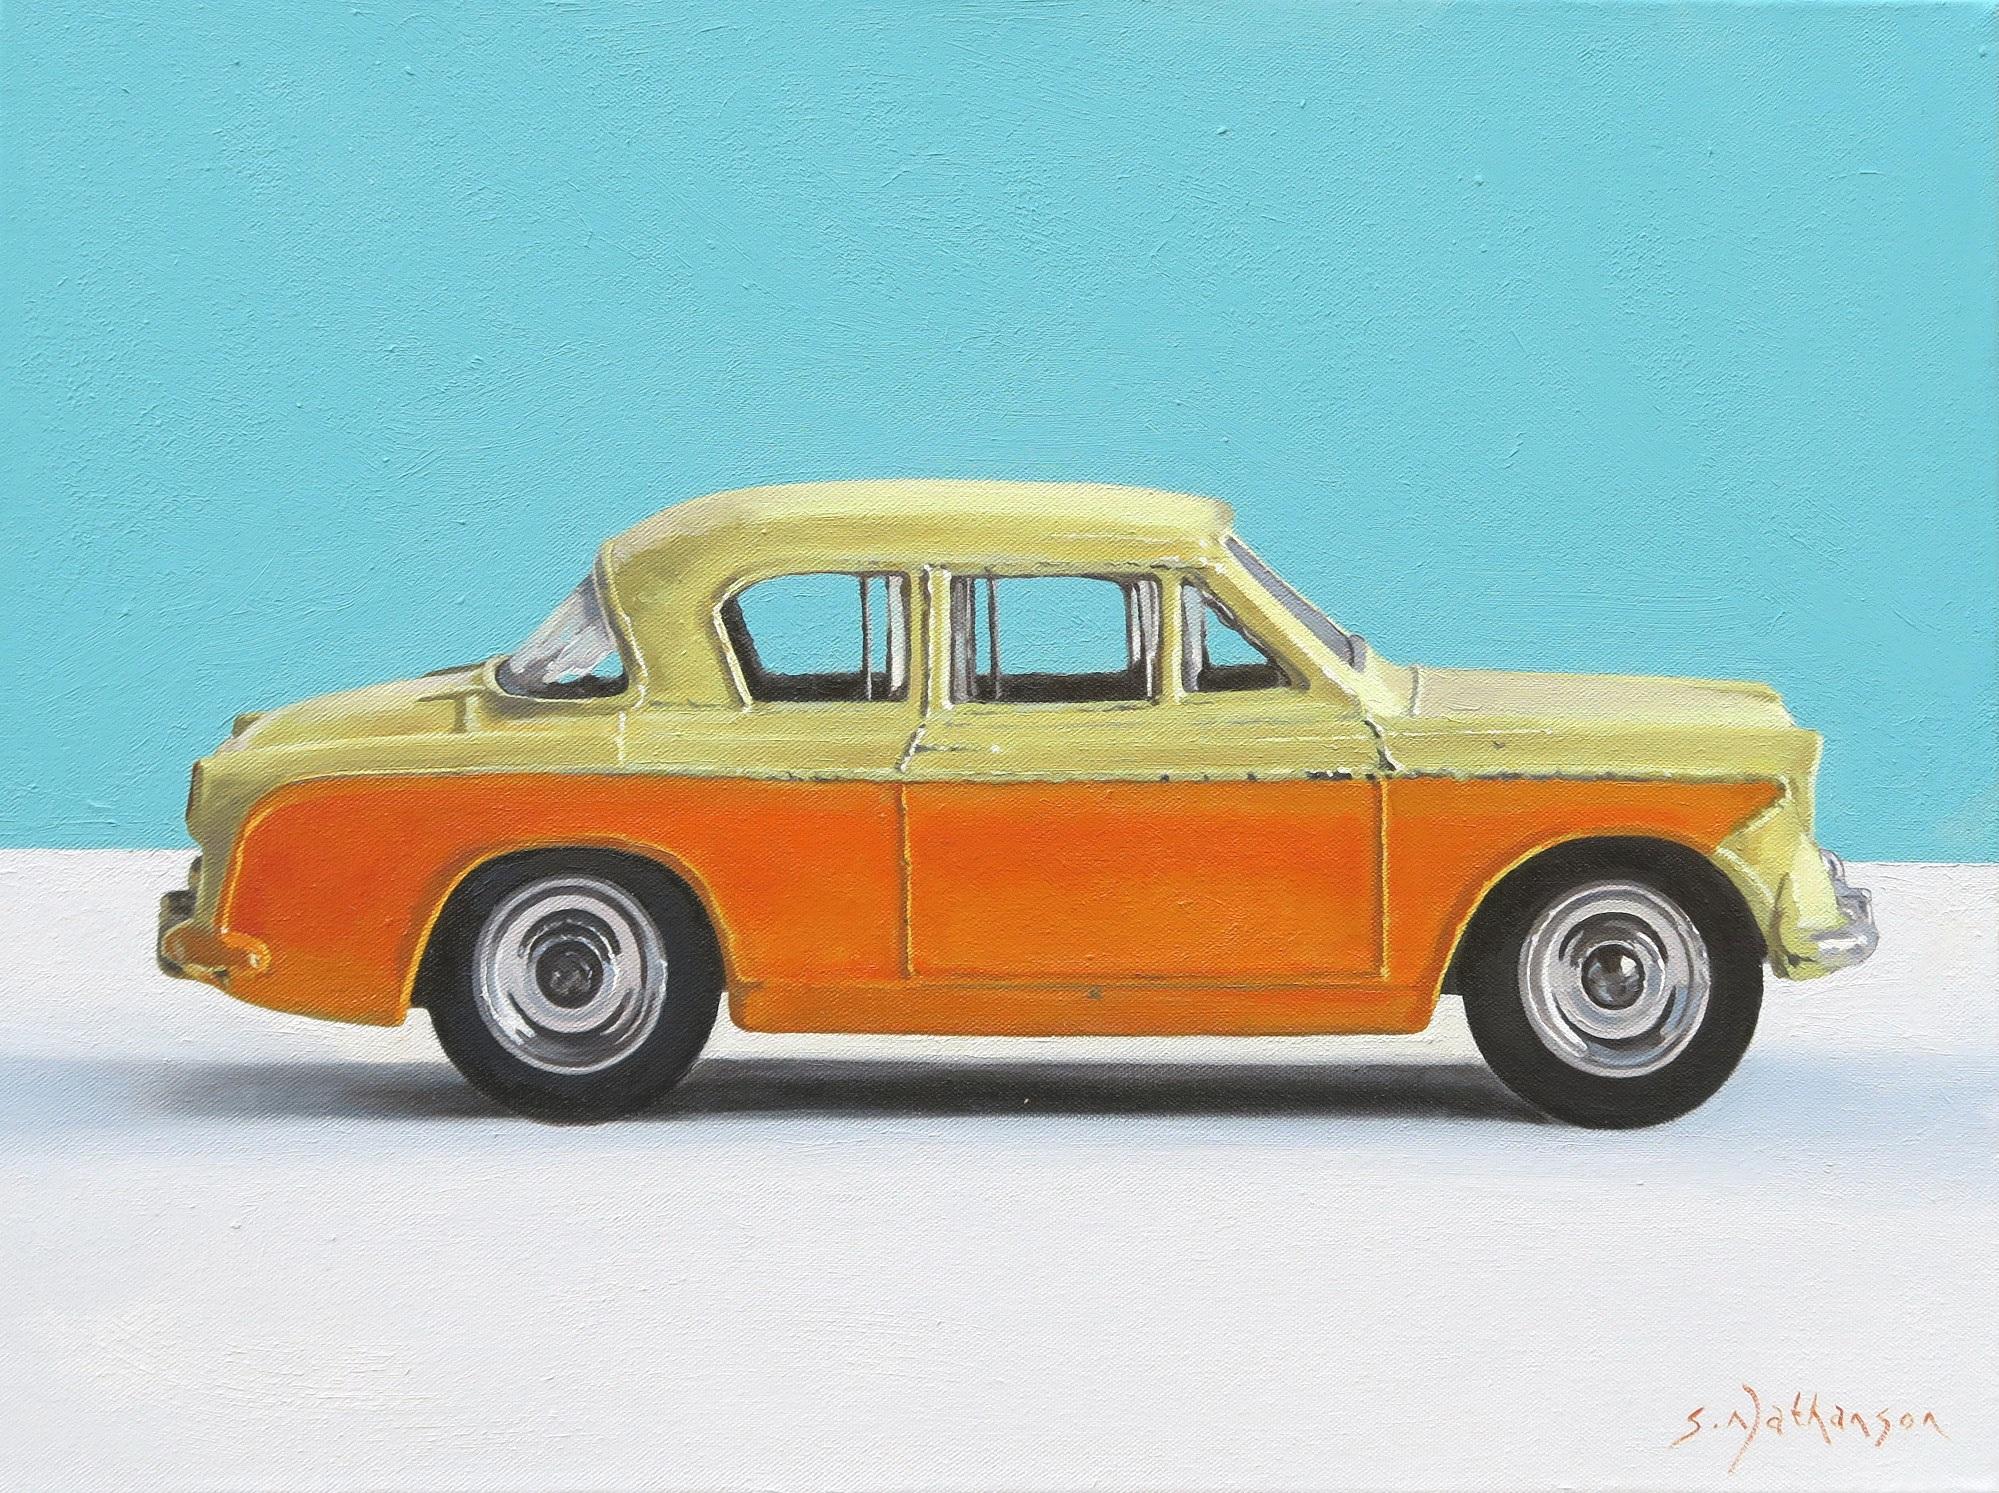 Sunbeam Rapier (Model no.166, 1958-1963)